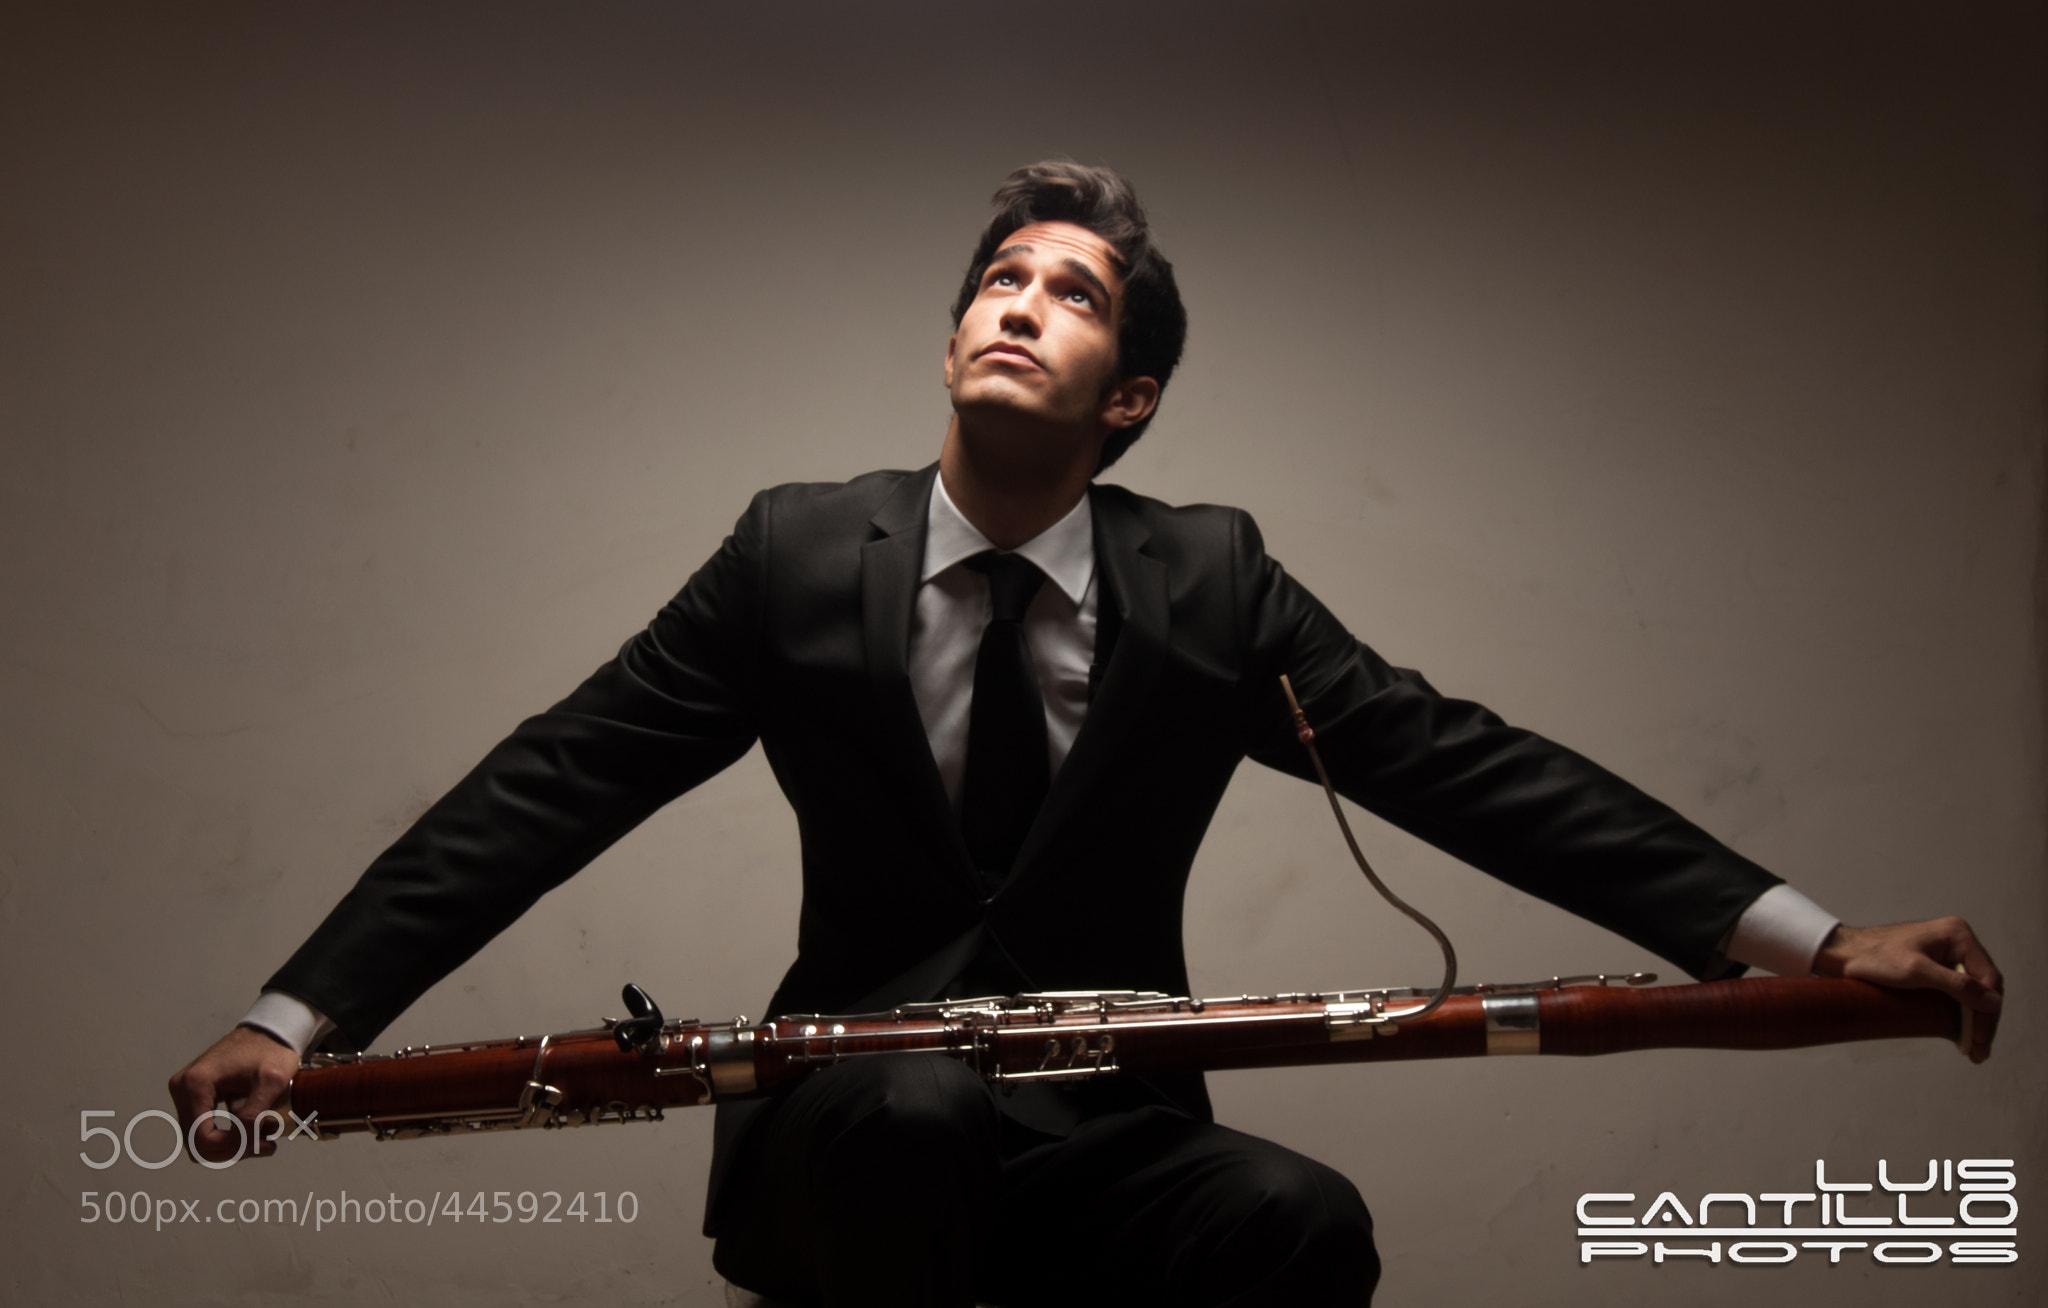 Photograph Juan Ruiz Bandoux / Fagotistaitled by Luis Cantillo on 500px